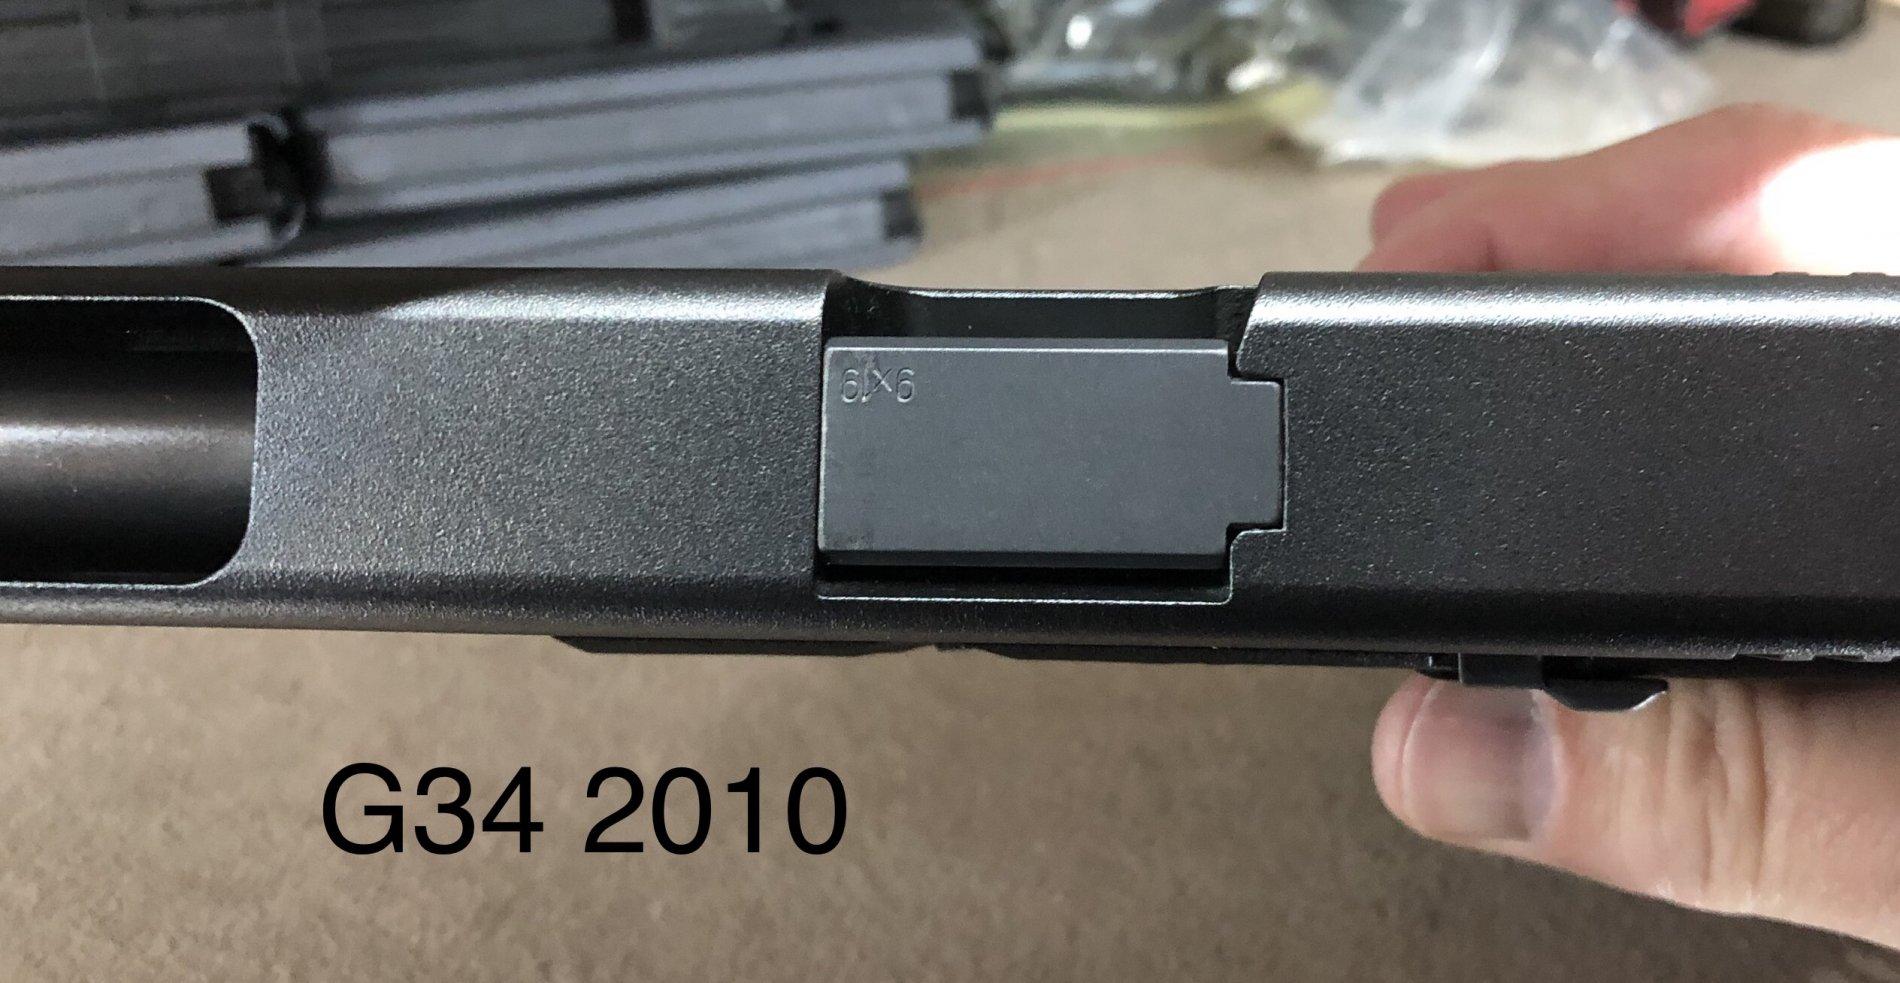 17B8AB0A-D45D-4027-996F-224203270BC1.jpeg